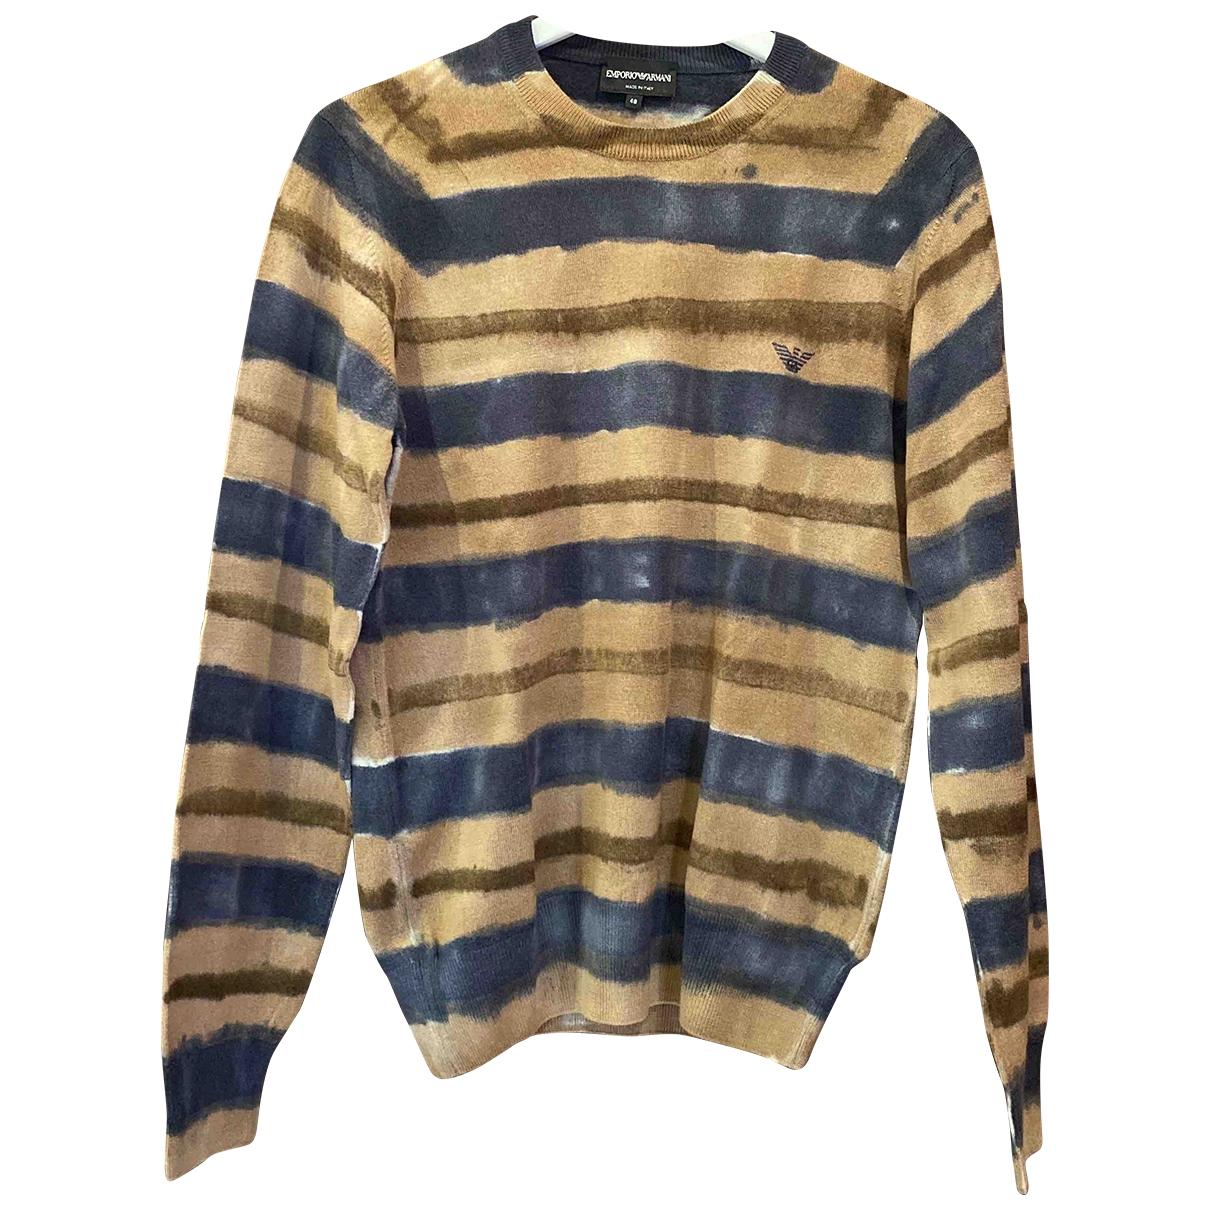 Emporio Armani \N Multicolour Cotton Knitwear & Sweatshirts for Men 48 IT